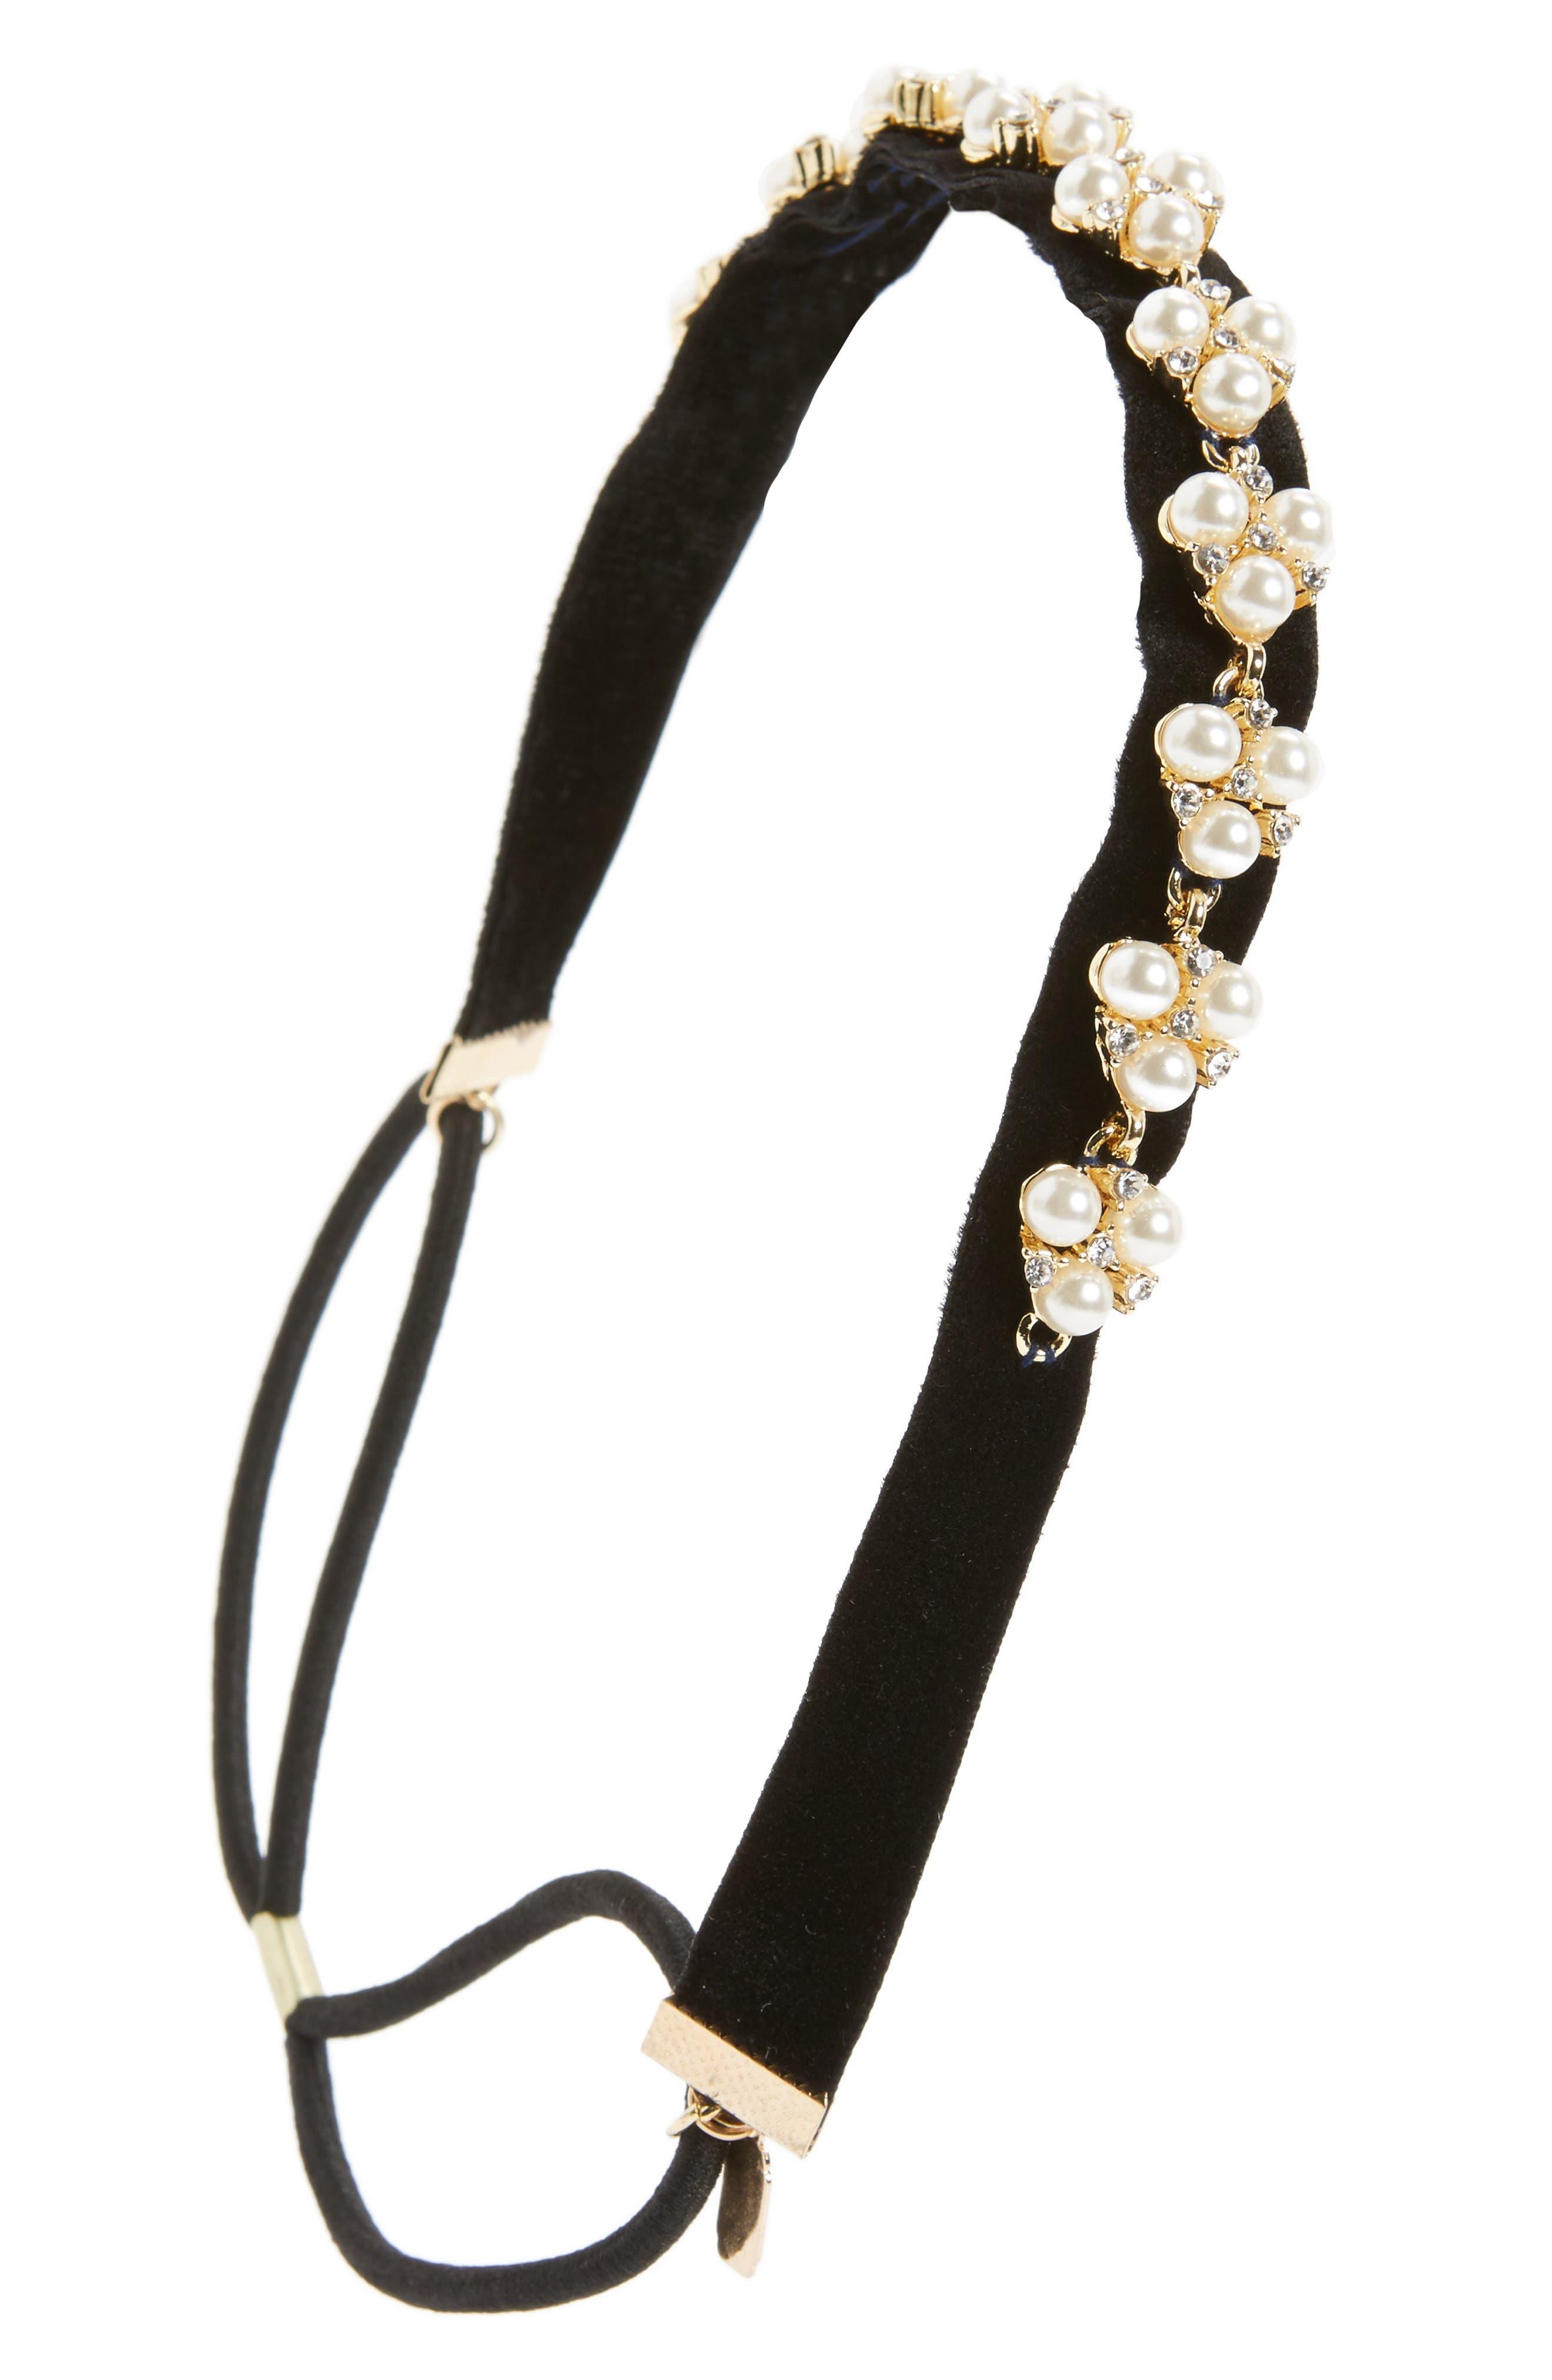 Crystal & Imitation Pearl Embellished Headwrap,                         Main,                         color, Black